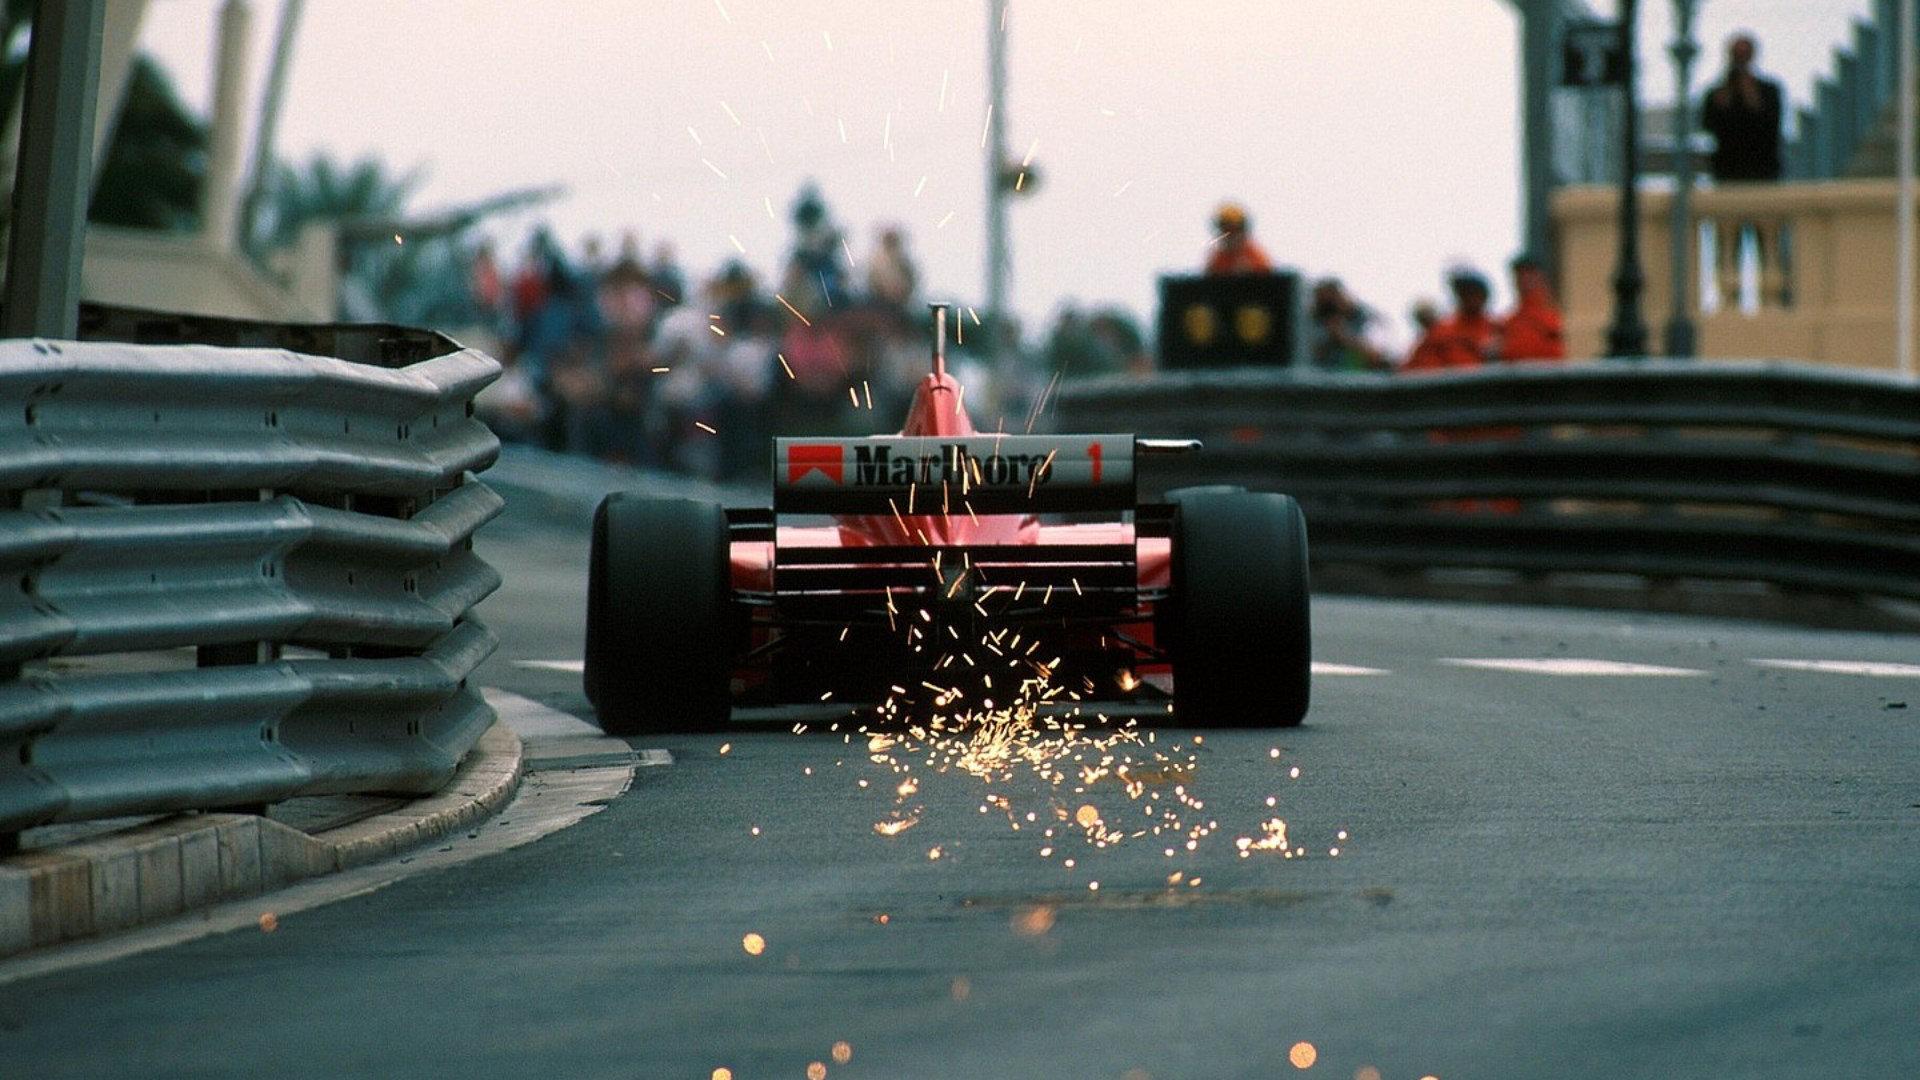 Free Download Ferrari F1 Background Id 381062 Hd 1920x1080 For Pc